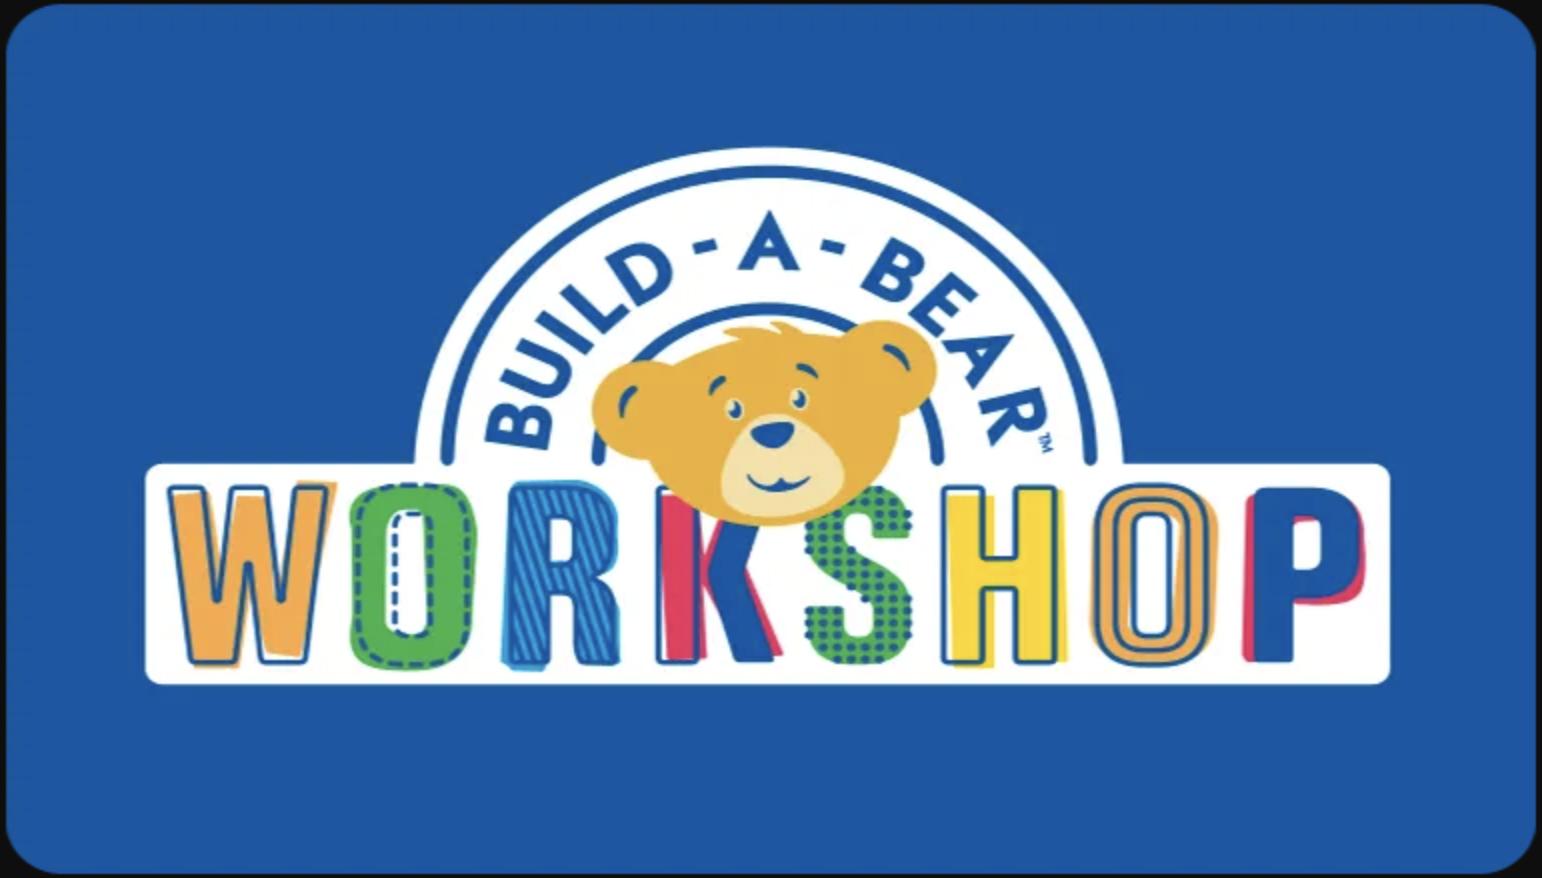 Build A Bear Workshop 75 - $50.00